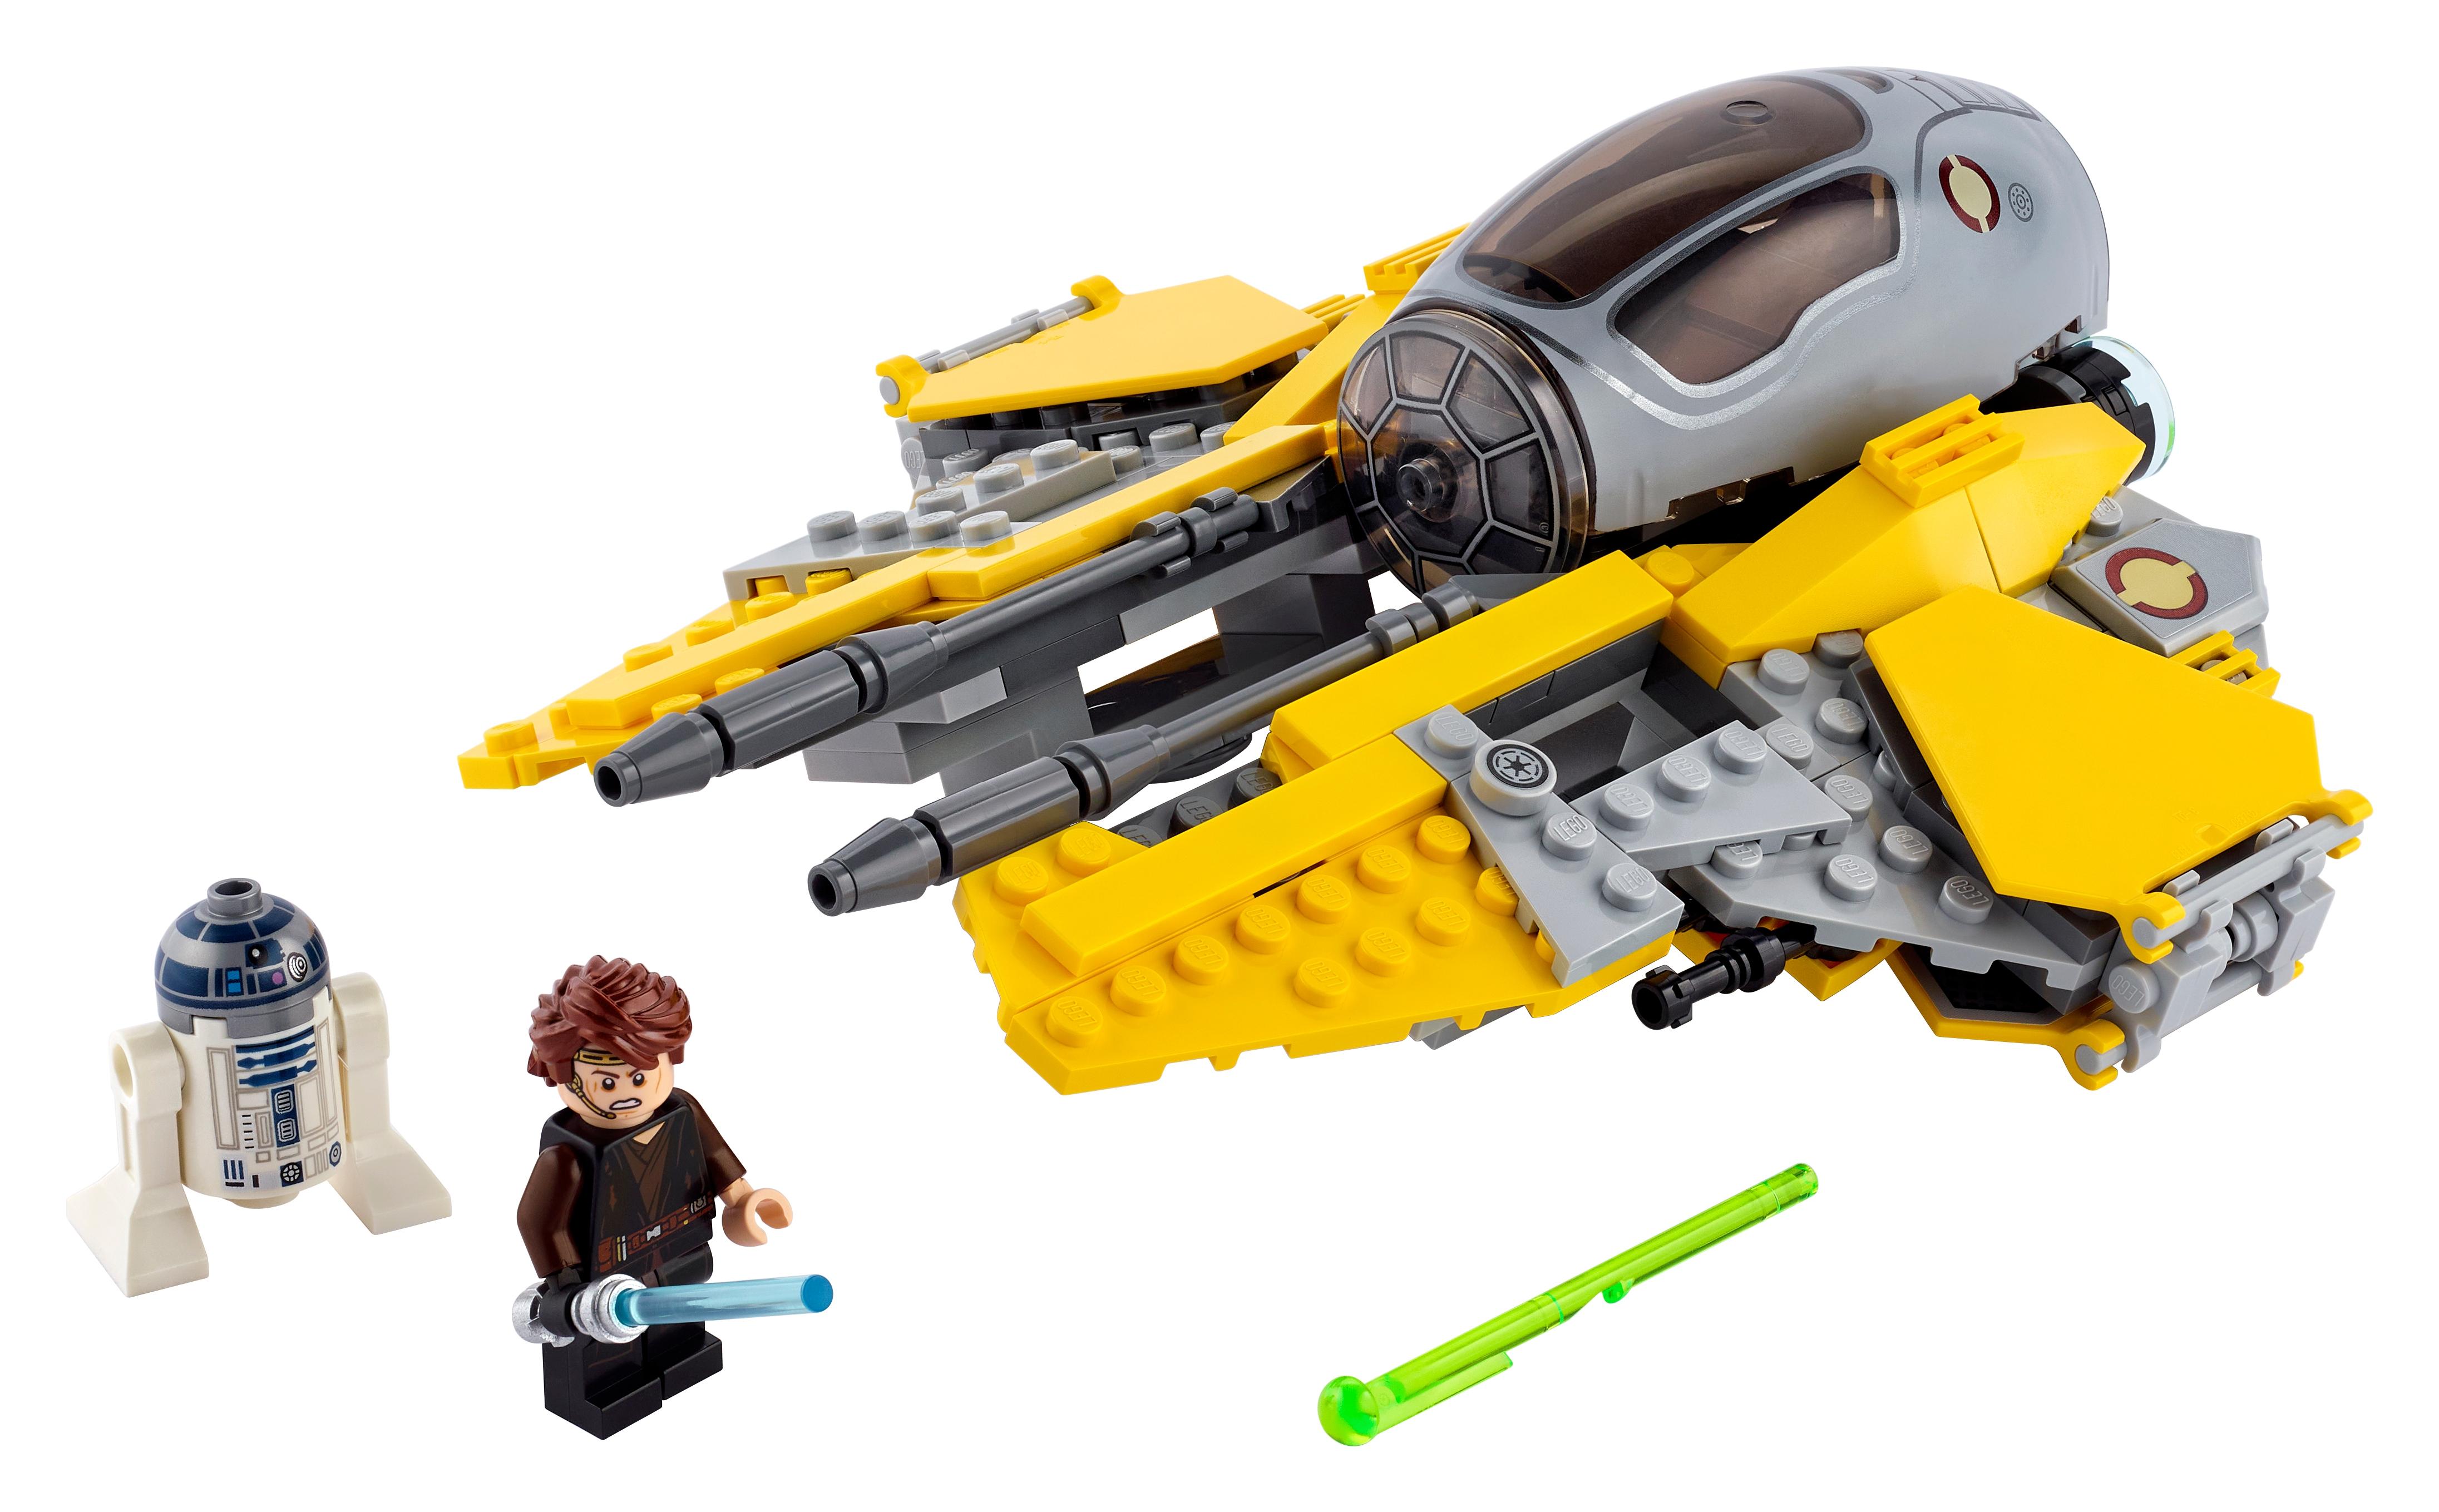 New Lego Star Wars Young Anakin Skywalker Minifigure